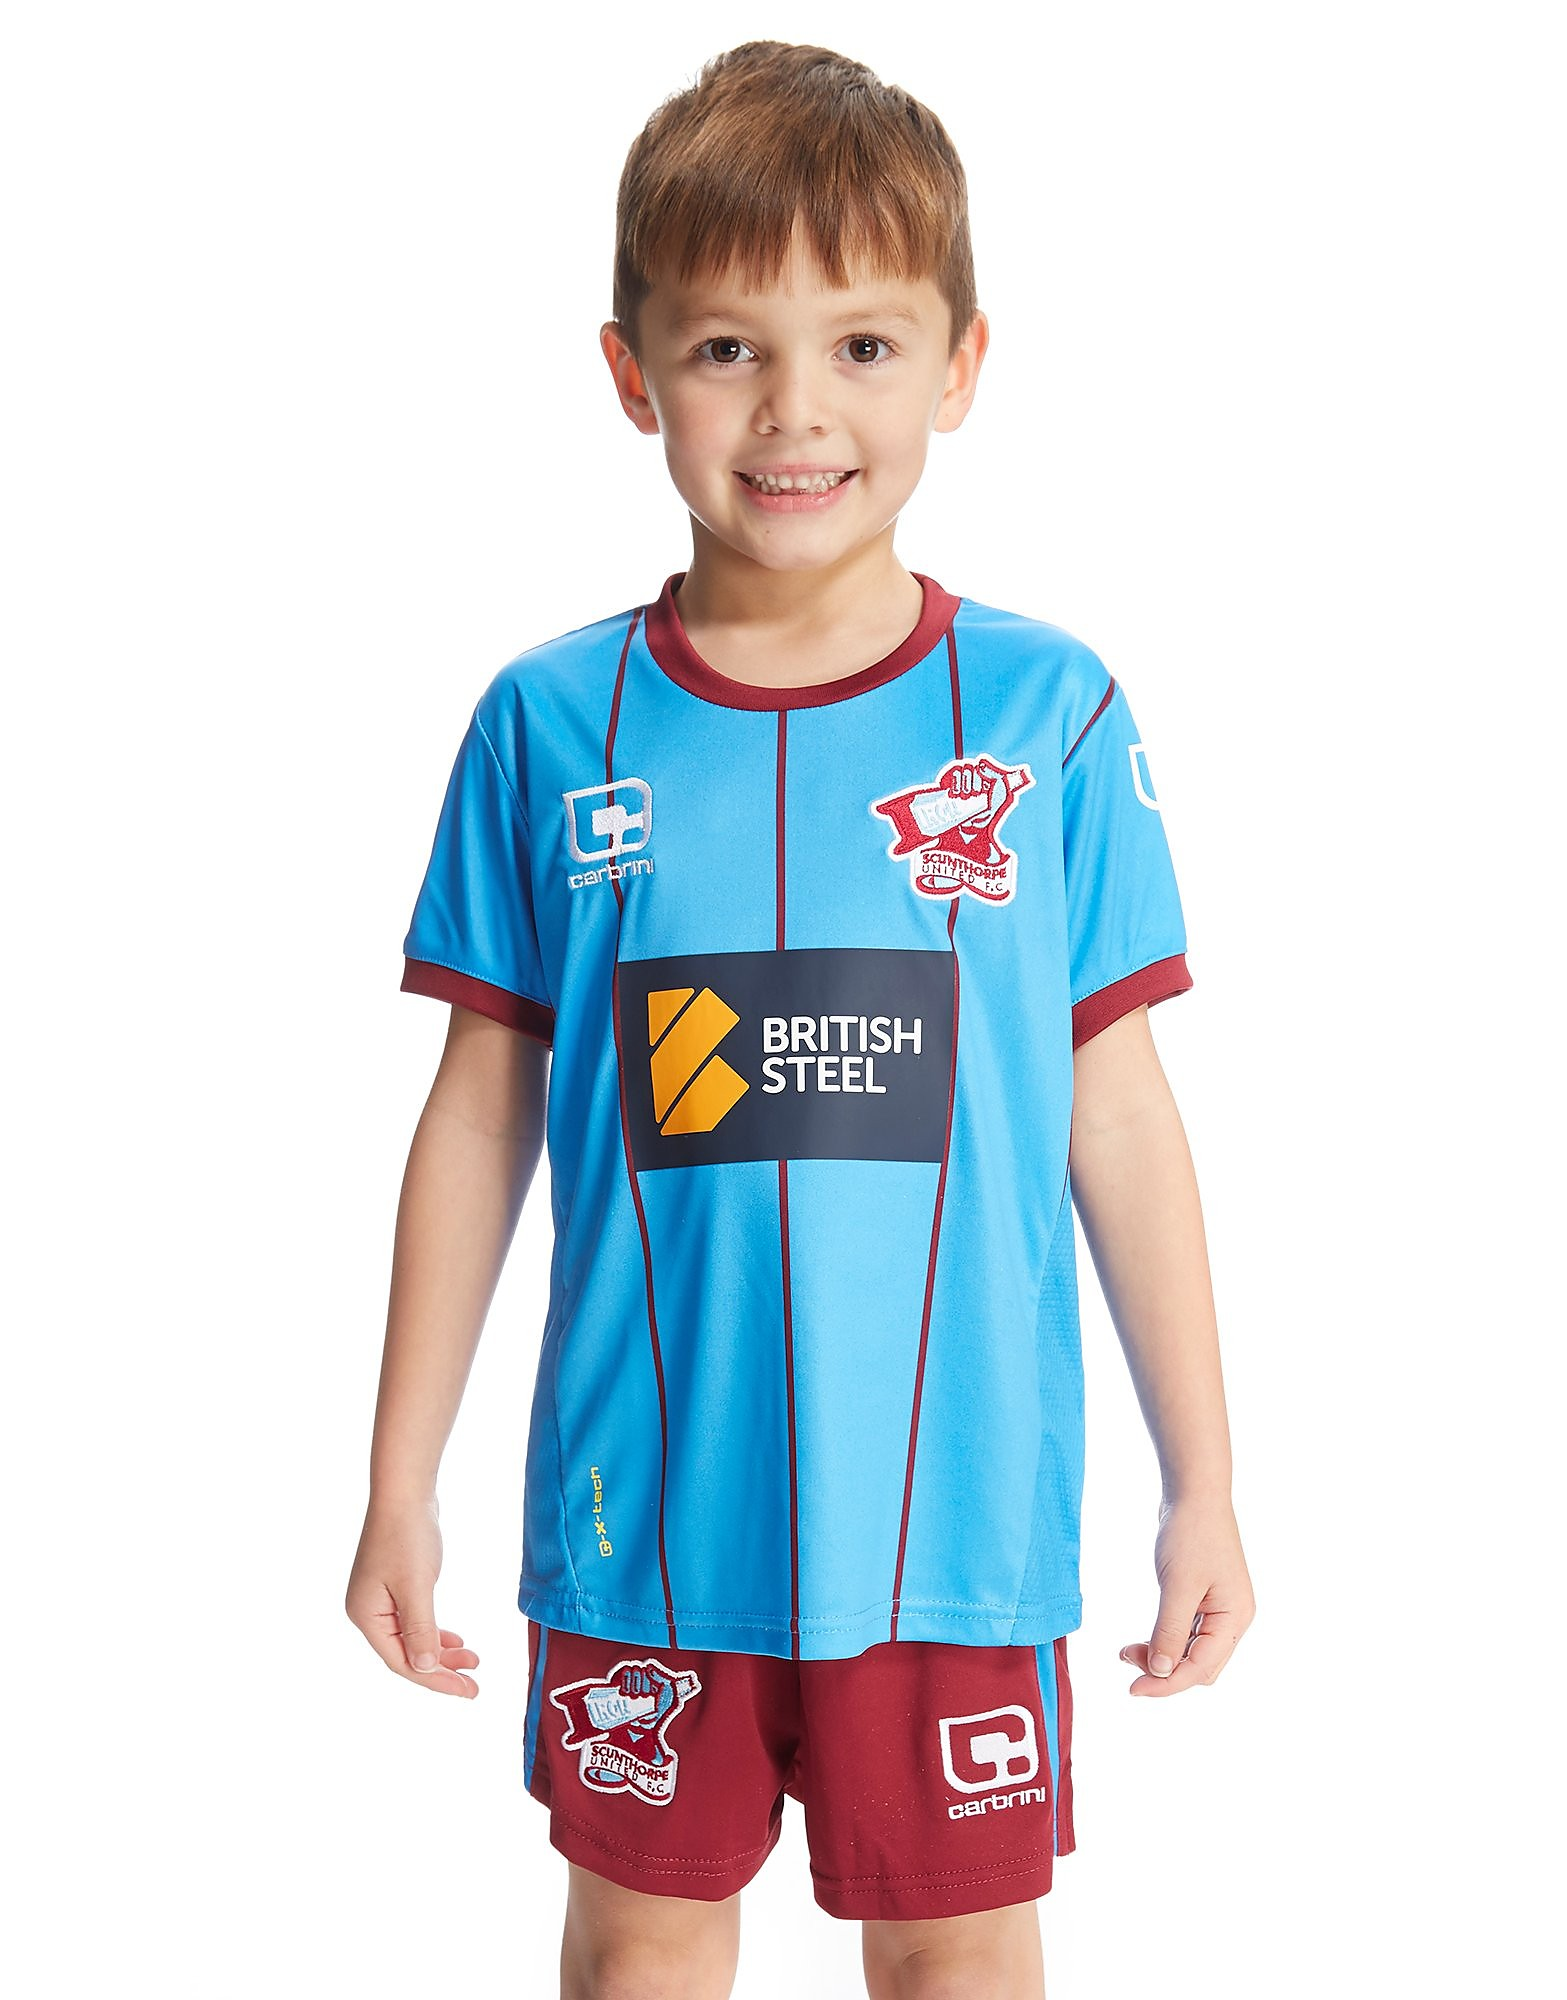 Carbrini Scunthorpe United FC 2016/17 Home Kit Children